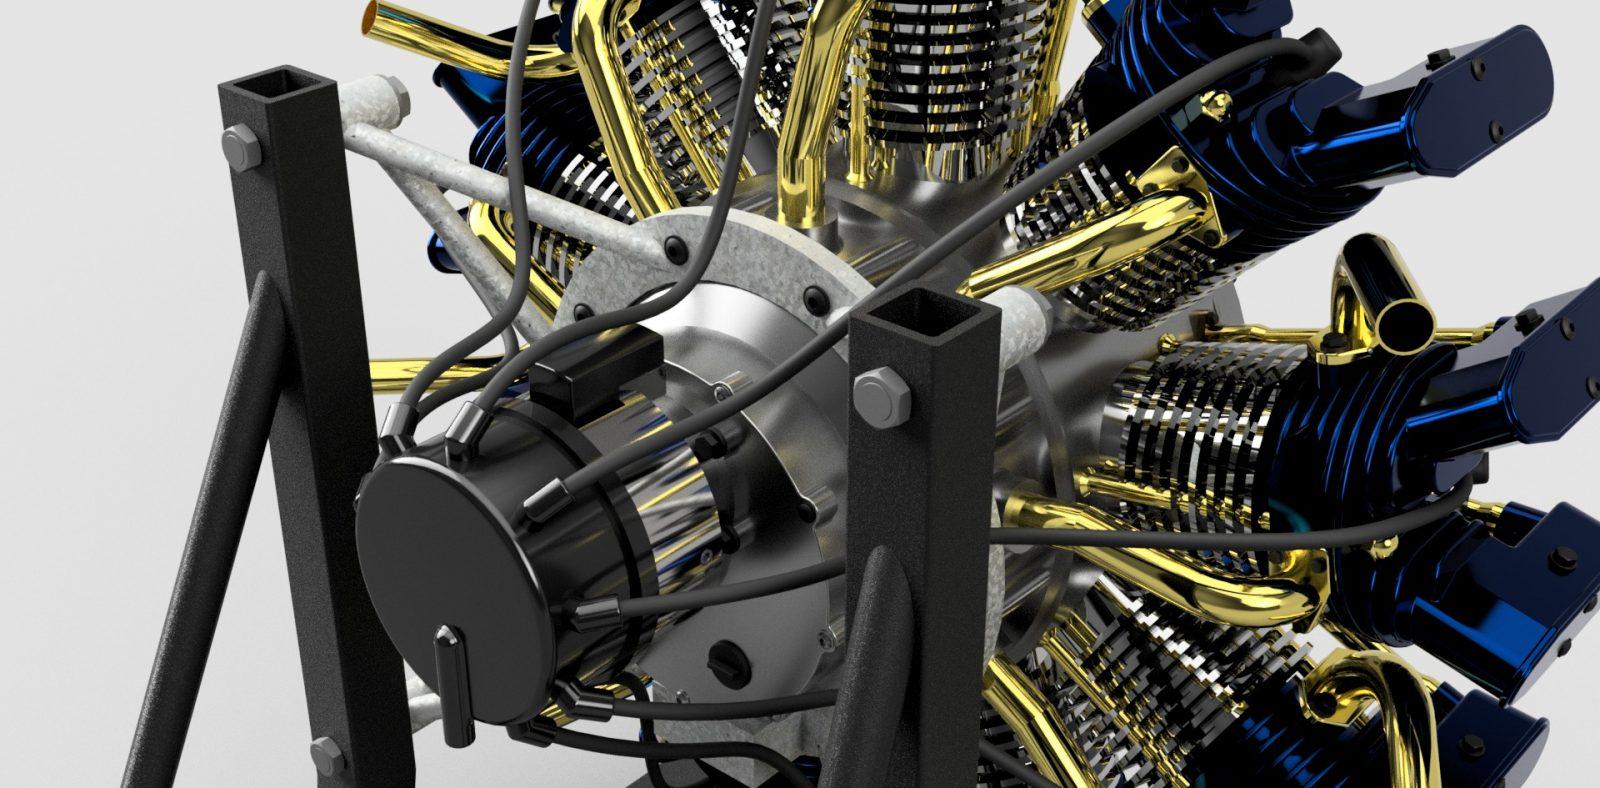 Photo credit: fusion360.autodesk.com